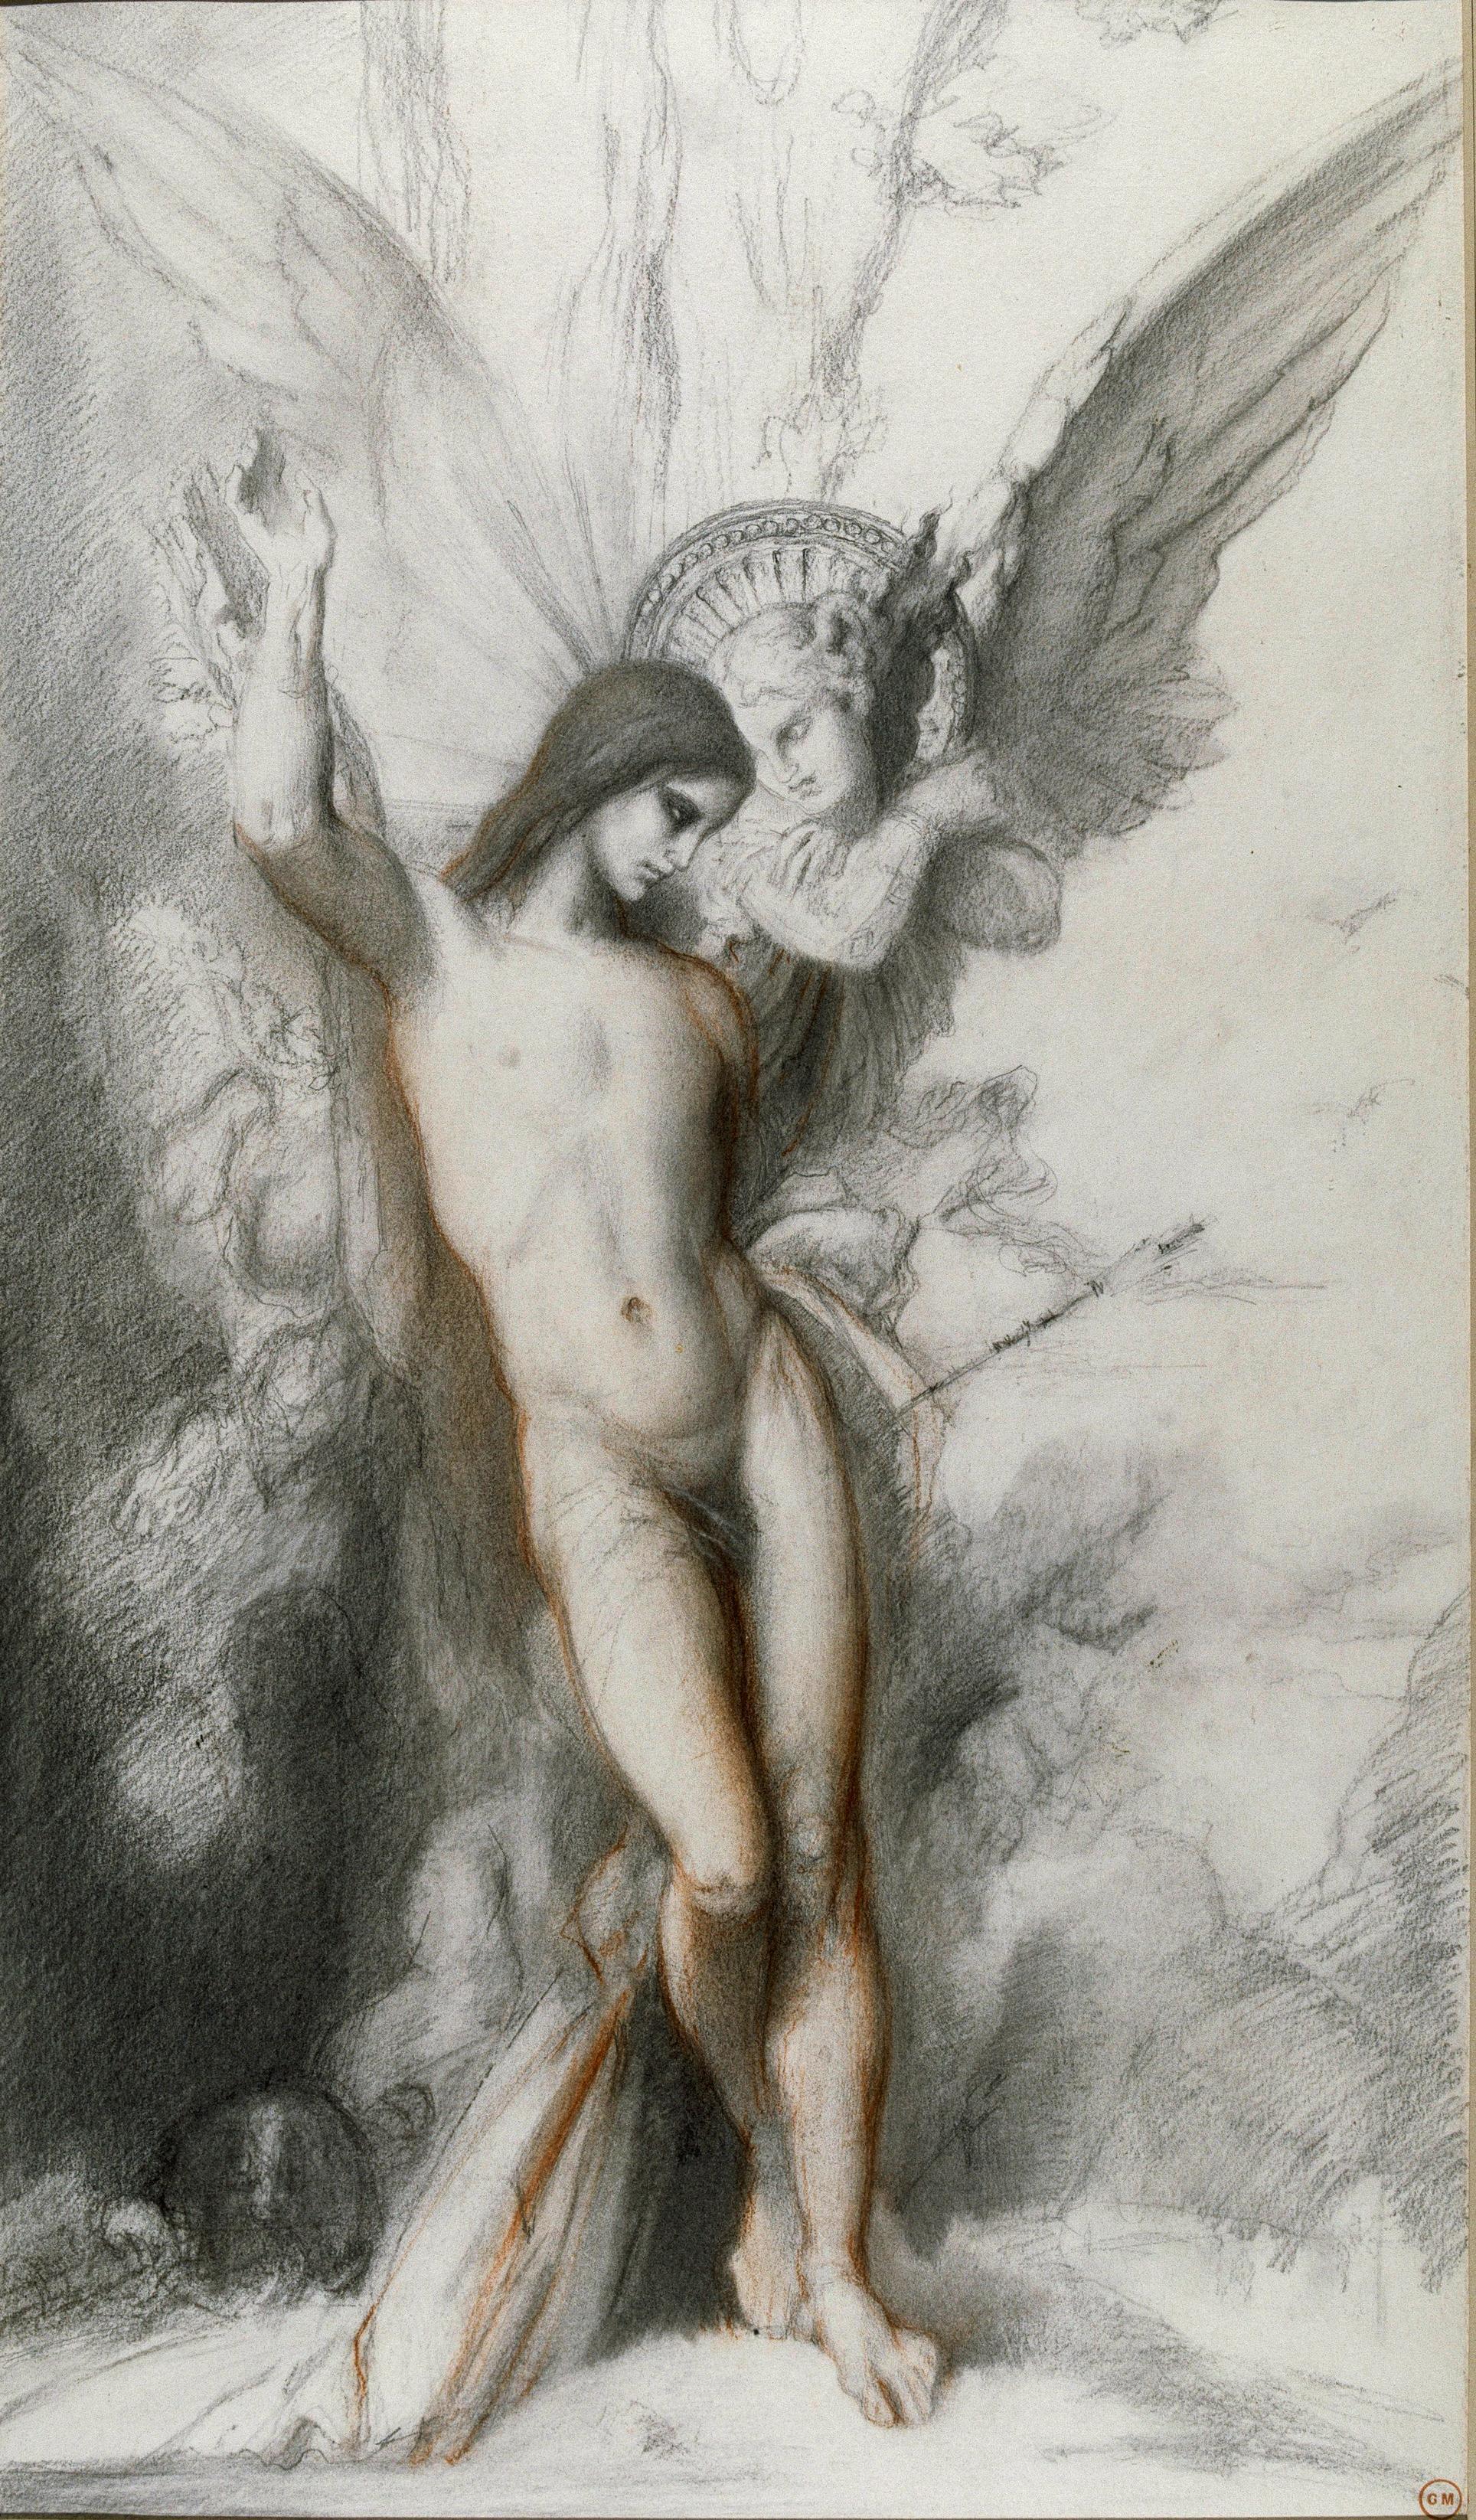 Святой Себастьян и ангел (61.4 х 35.8 см) (свинцовый карандаш, сангина) (Париж, музей Гюстава Моро)